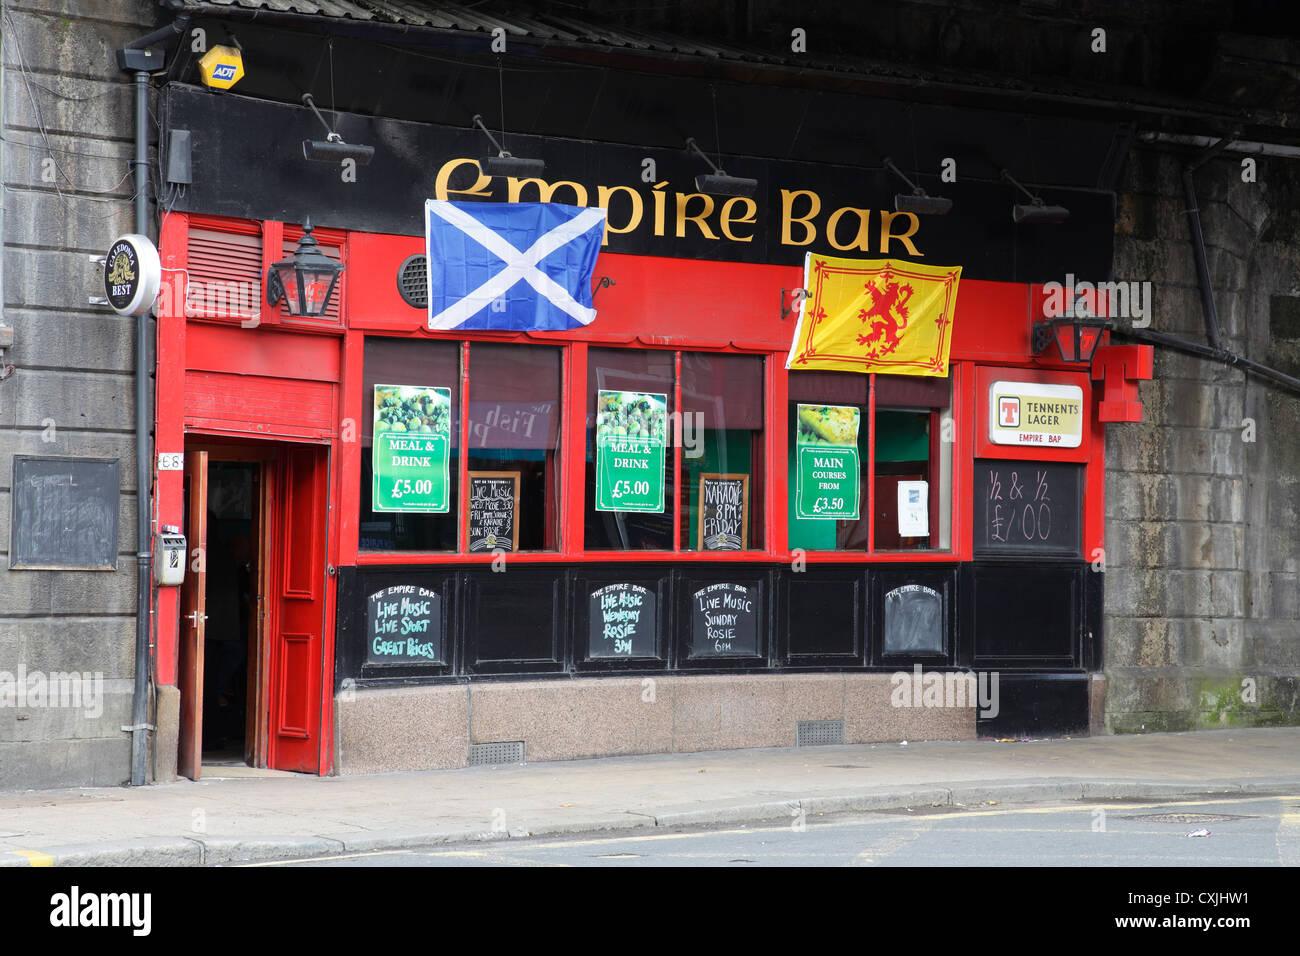 The Empire Bar on Saltmarket in the Merchant City area of Glasgow city centre, Scotland, UK - Stock Image